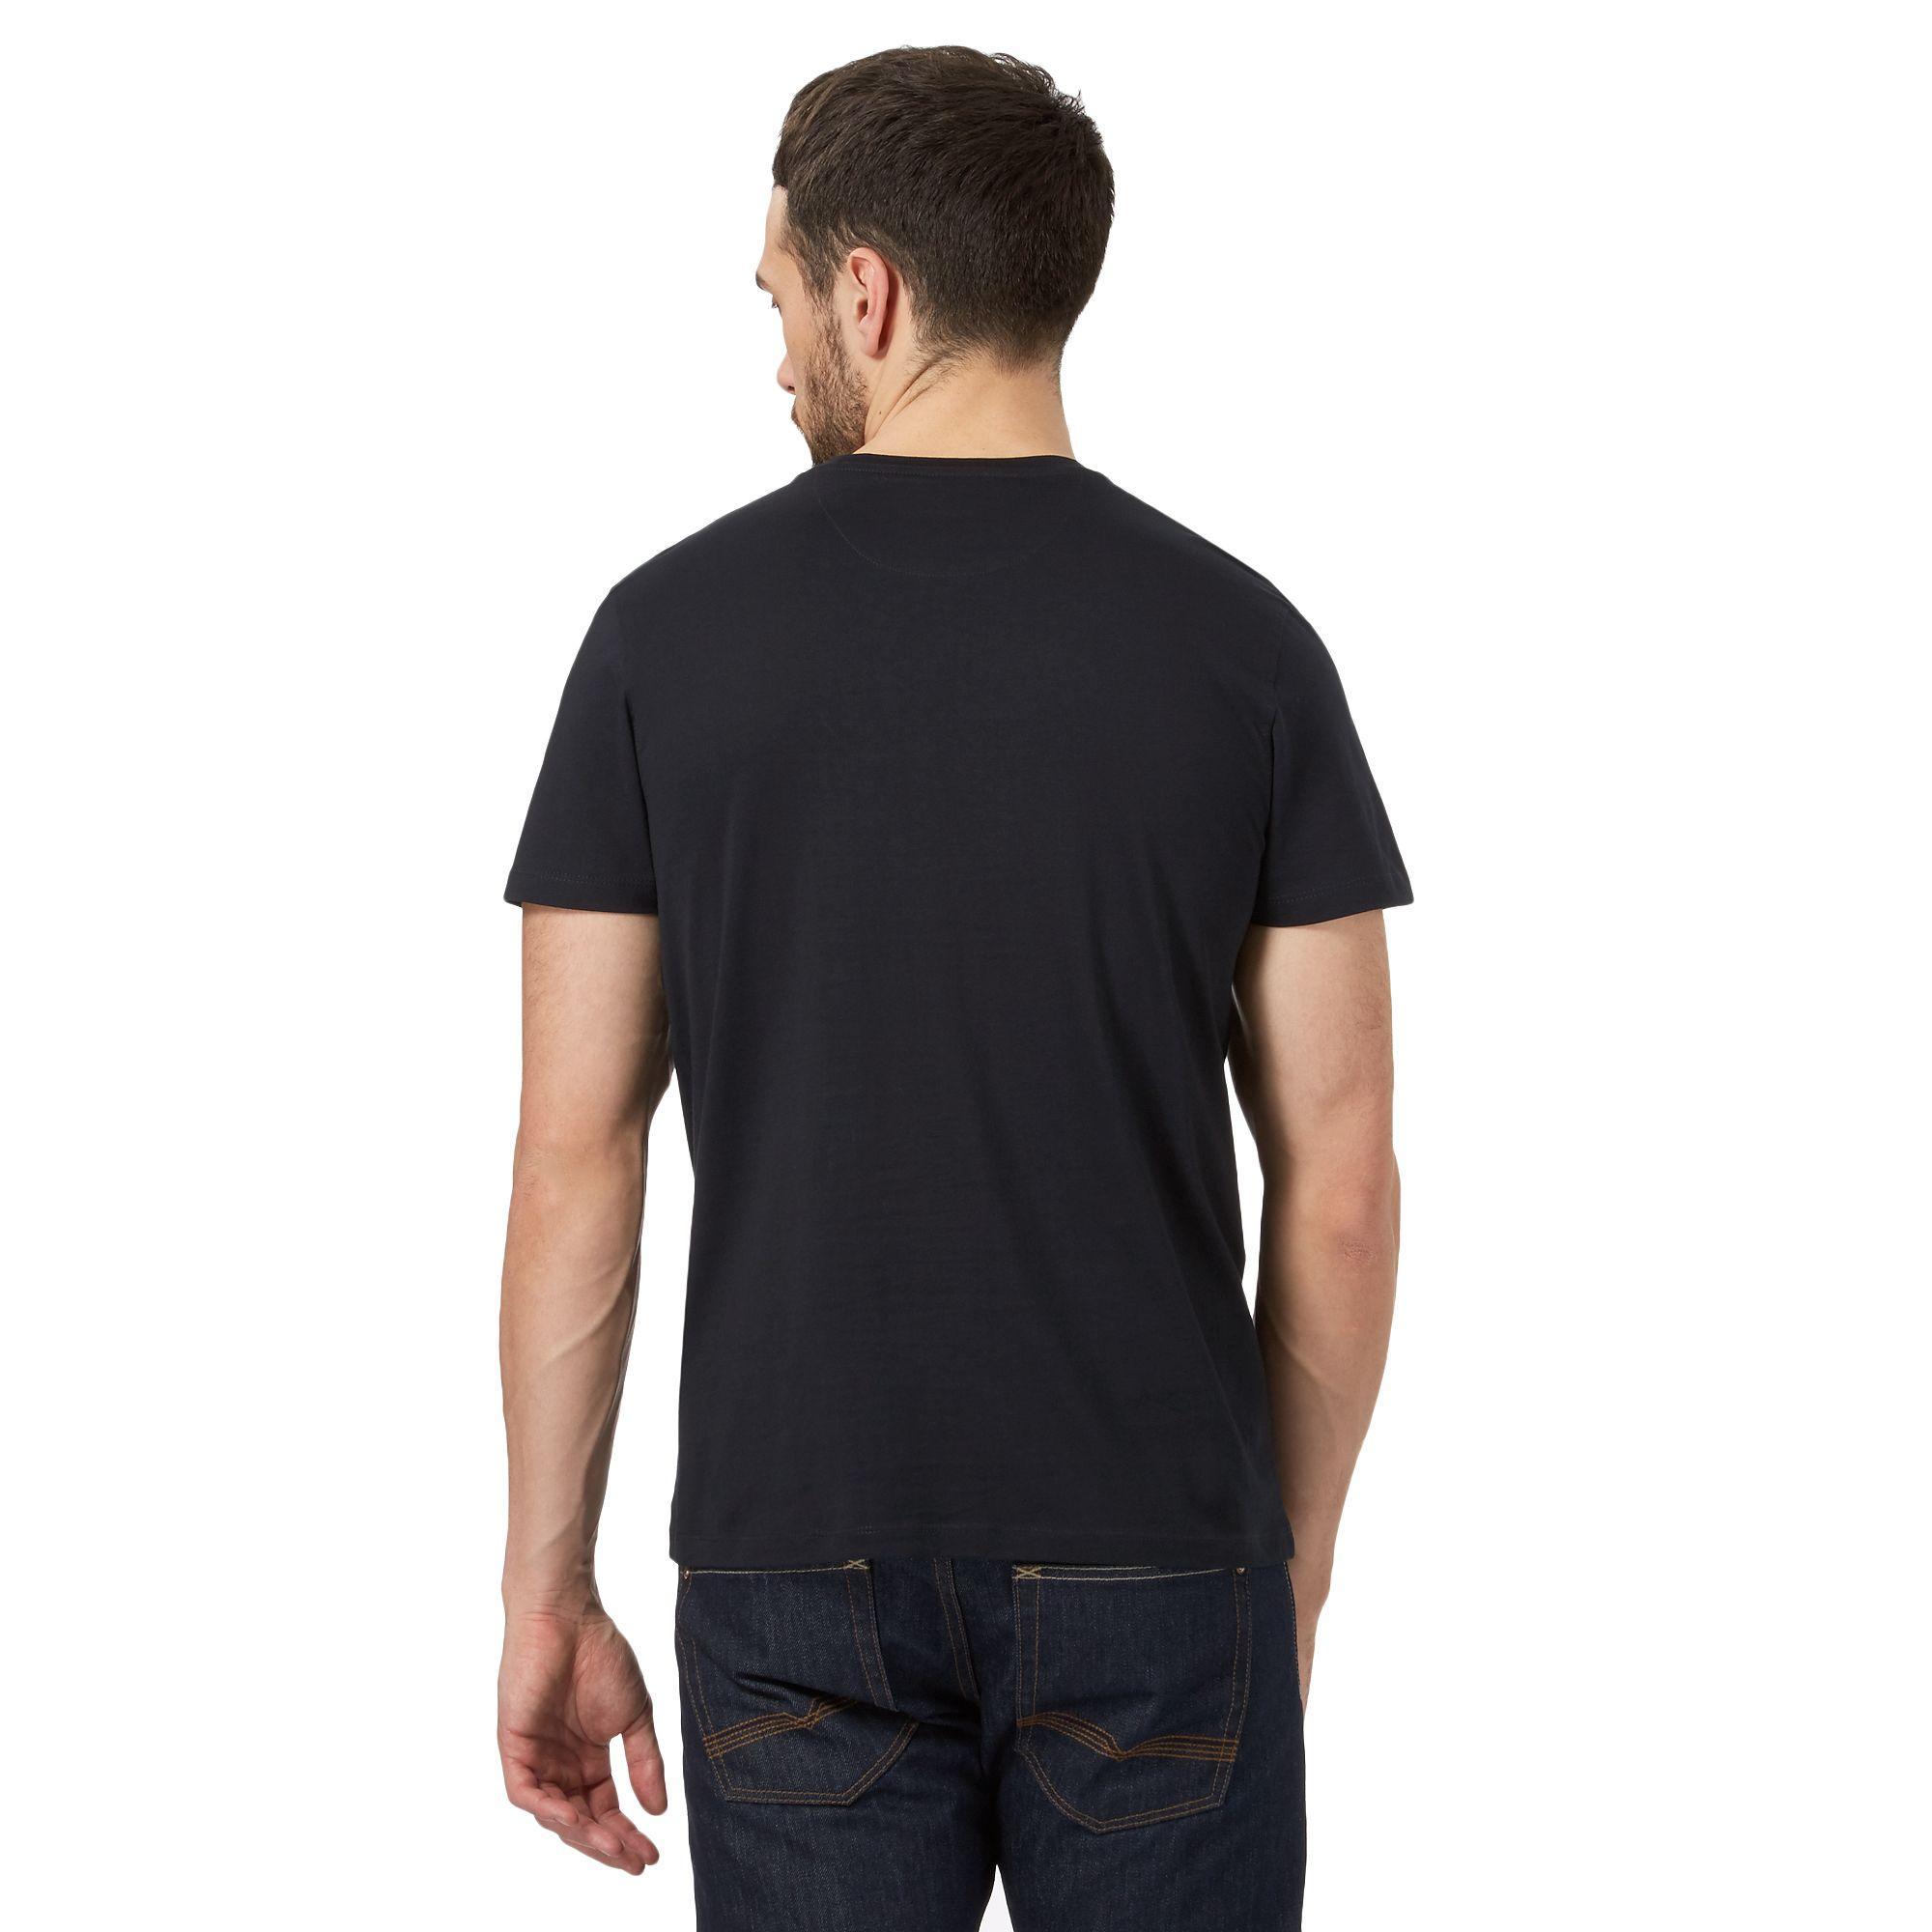 519a67b7 J By Jasper Conran Navy Supima Cotton T-shirt in Blue for Men - Lyst